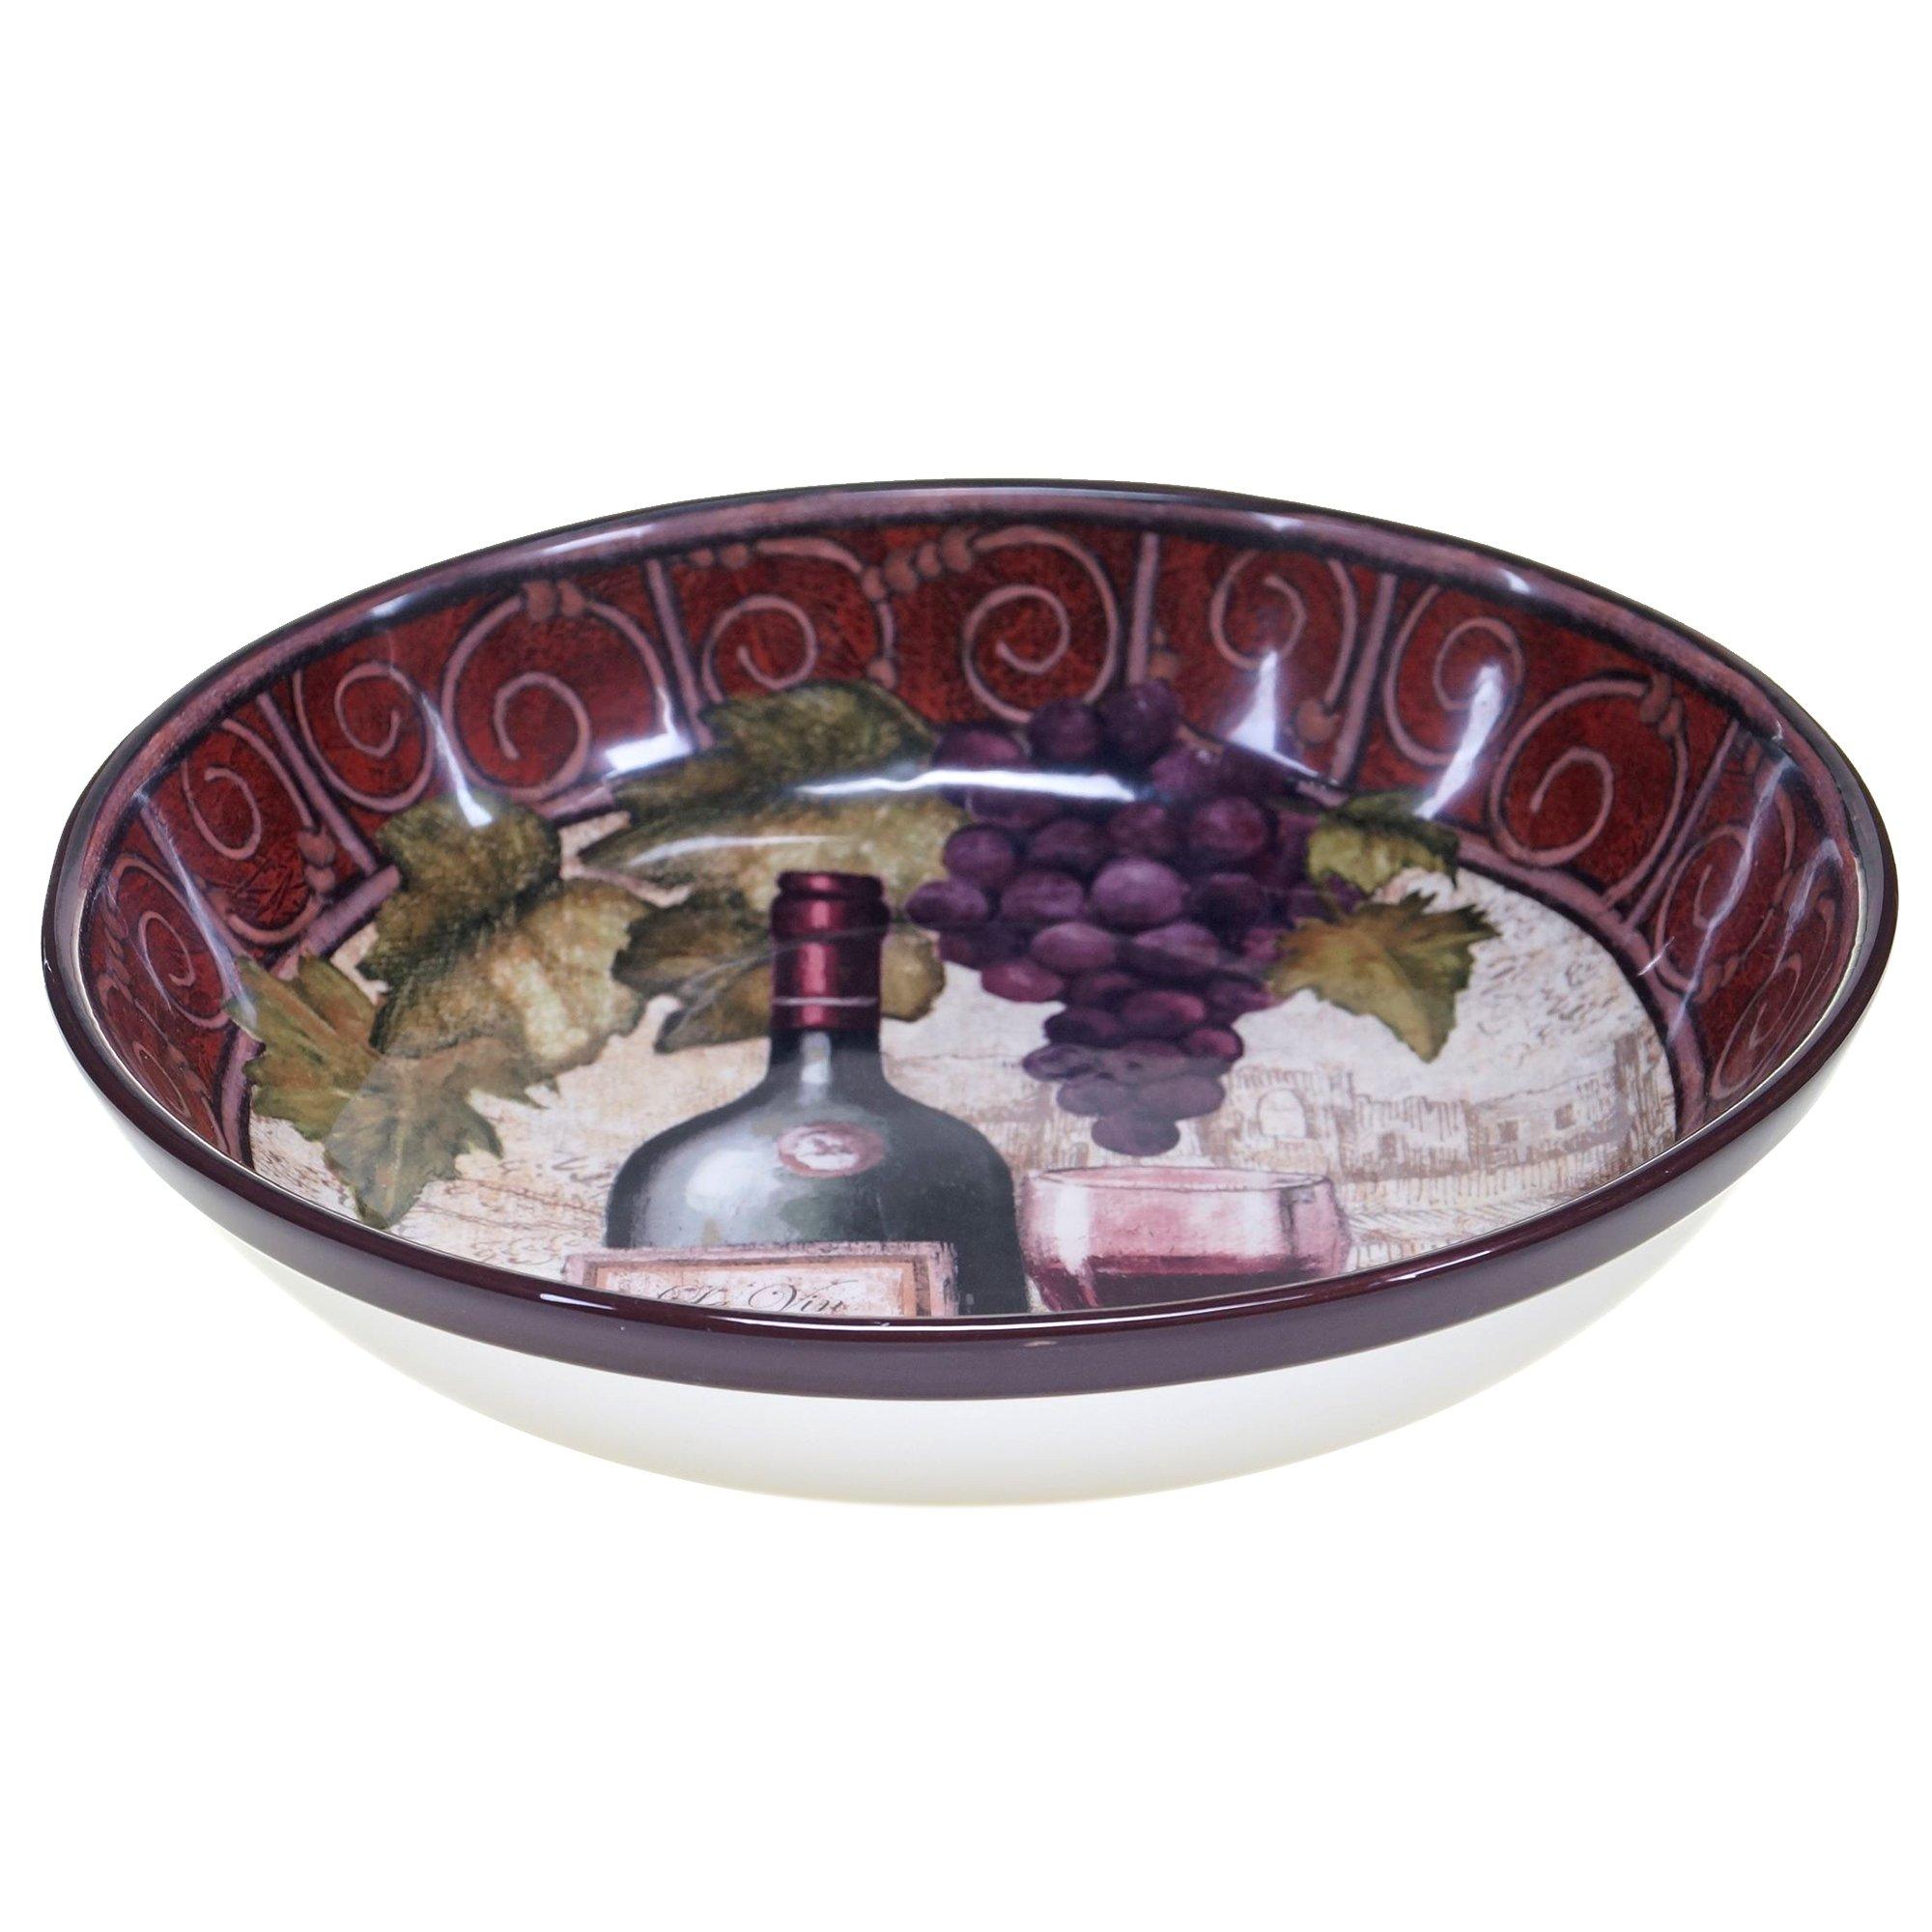 Certified International 57459 Wine Tasting Serving/Pasta Bowl, 13.25'' x 3'', Multicolor